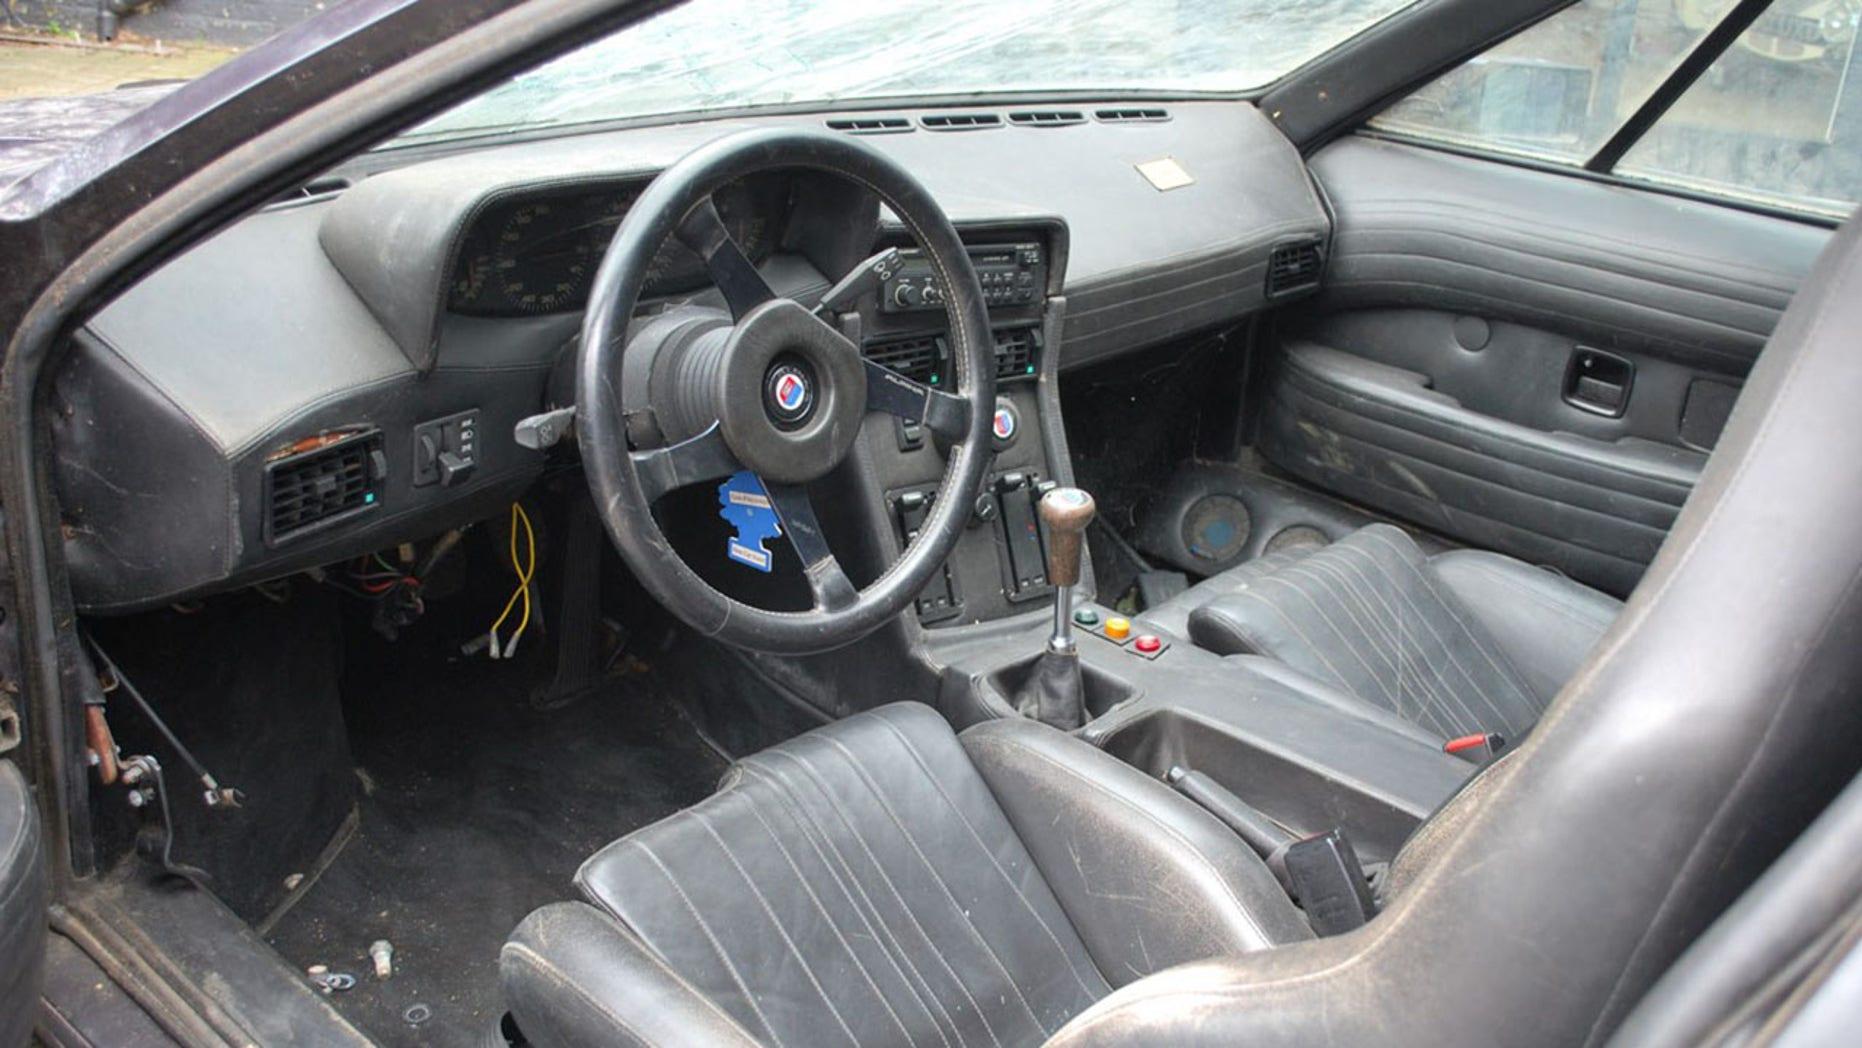 Legendary Lost BMW M1 interior